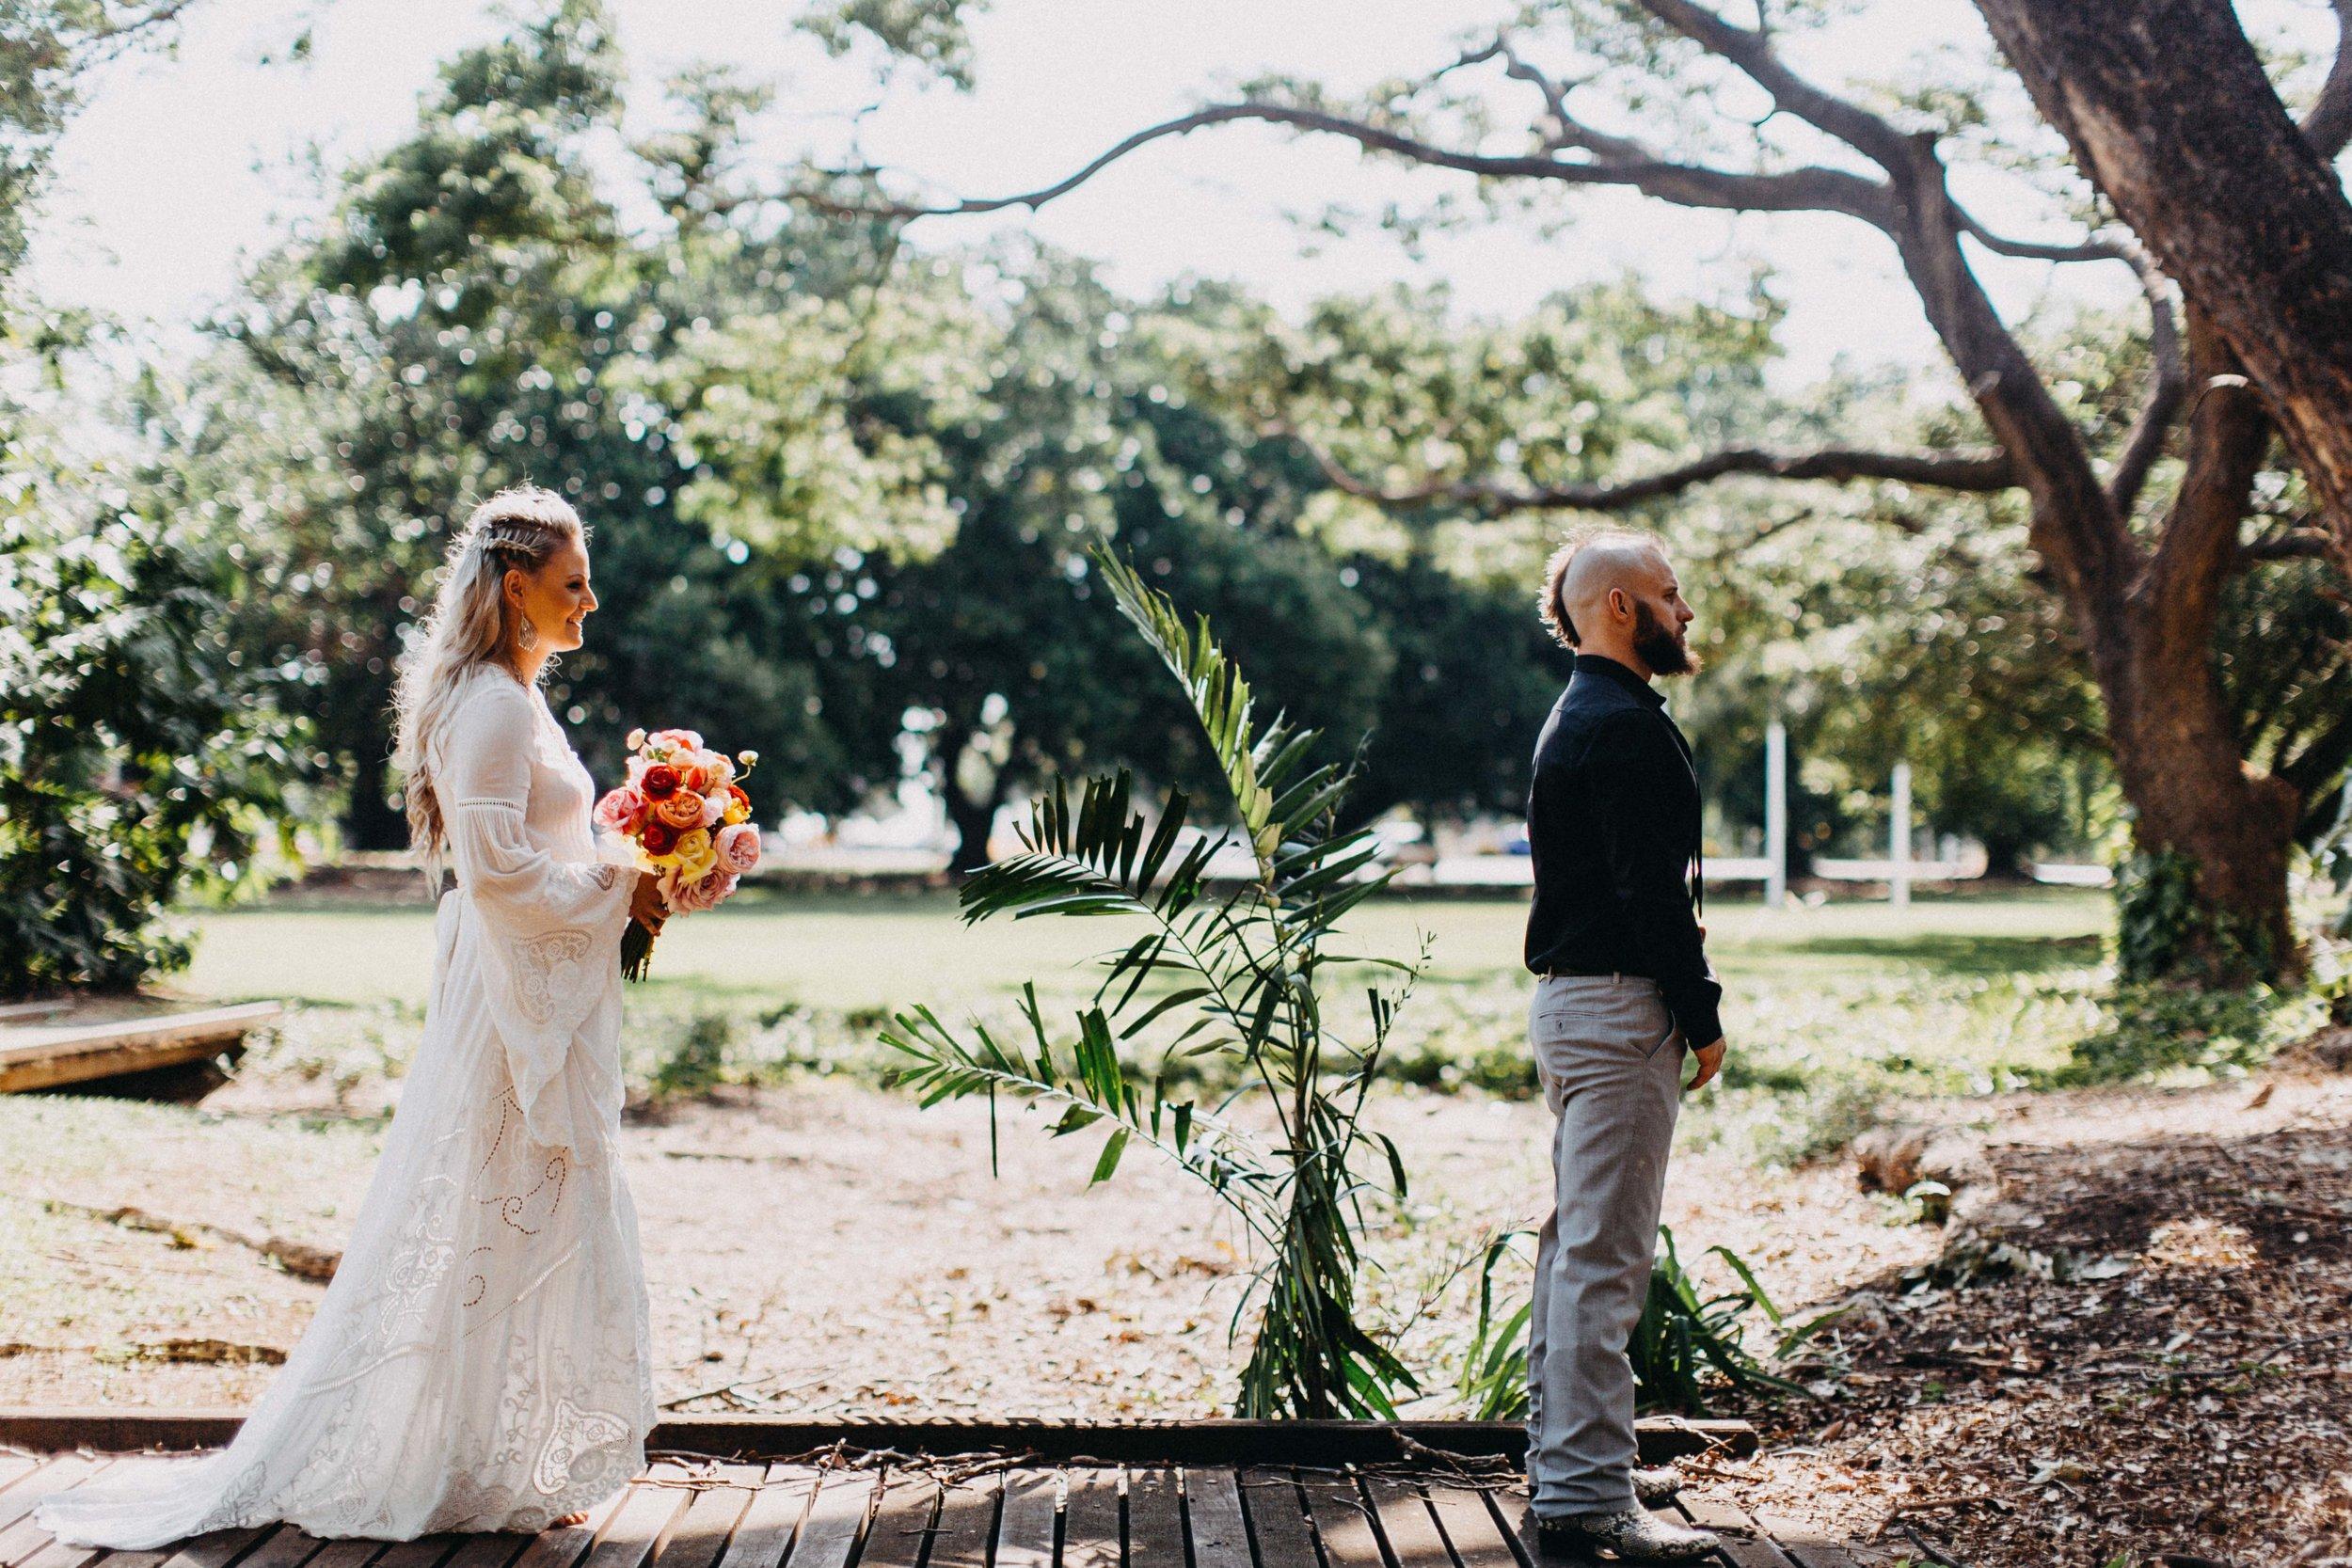 darwin-elopement-wedding-beach-camden-photography-www.emilyobrienphotography.net-3.jpg